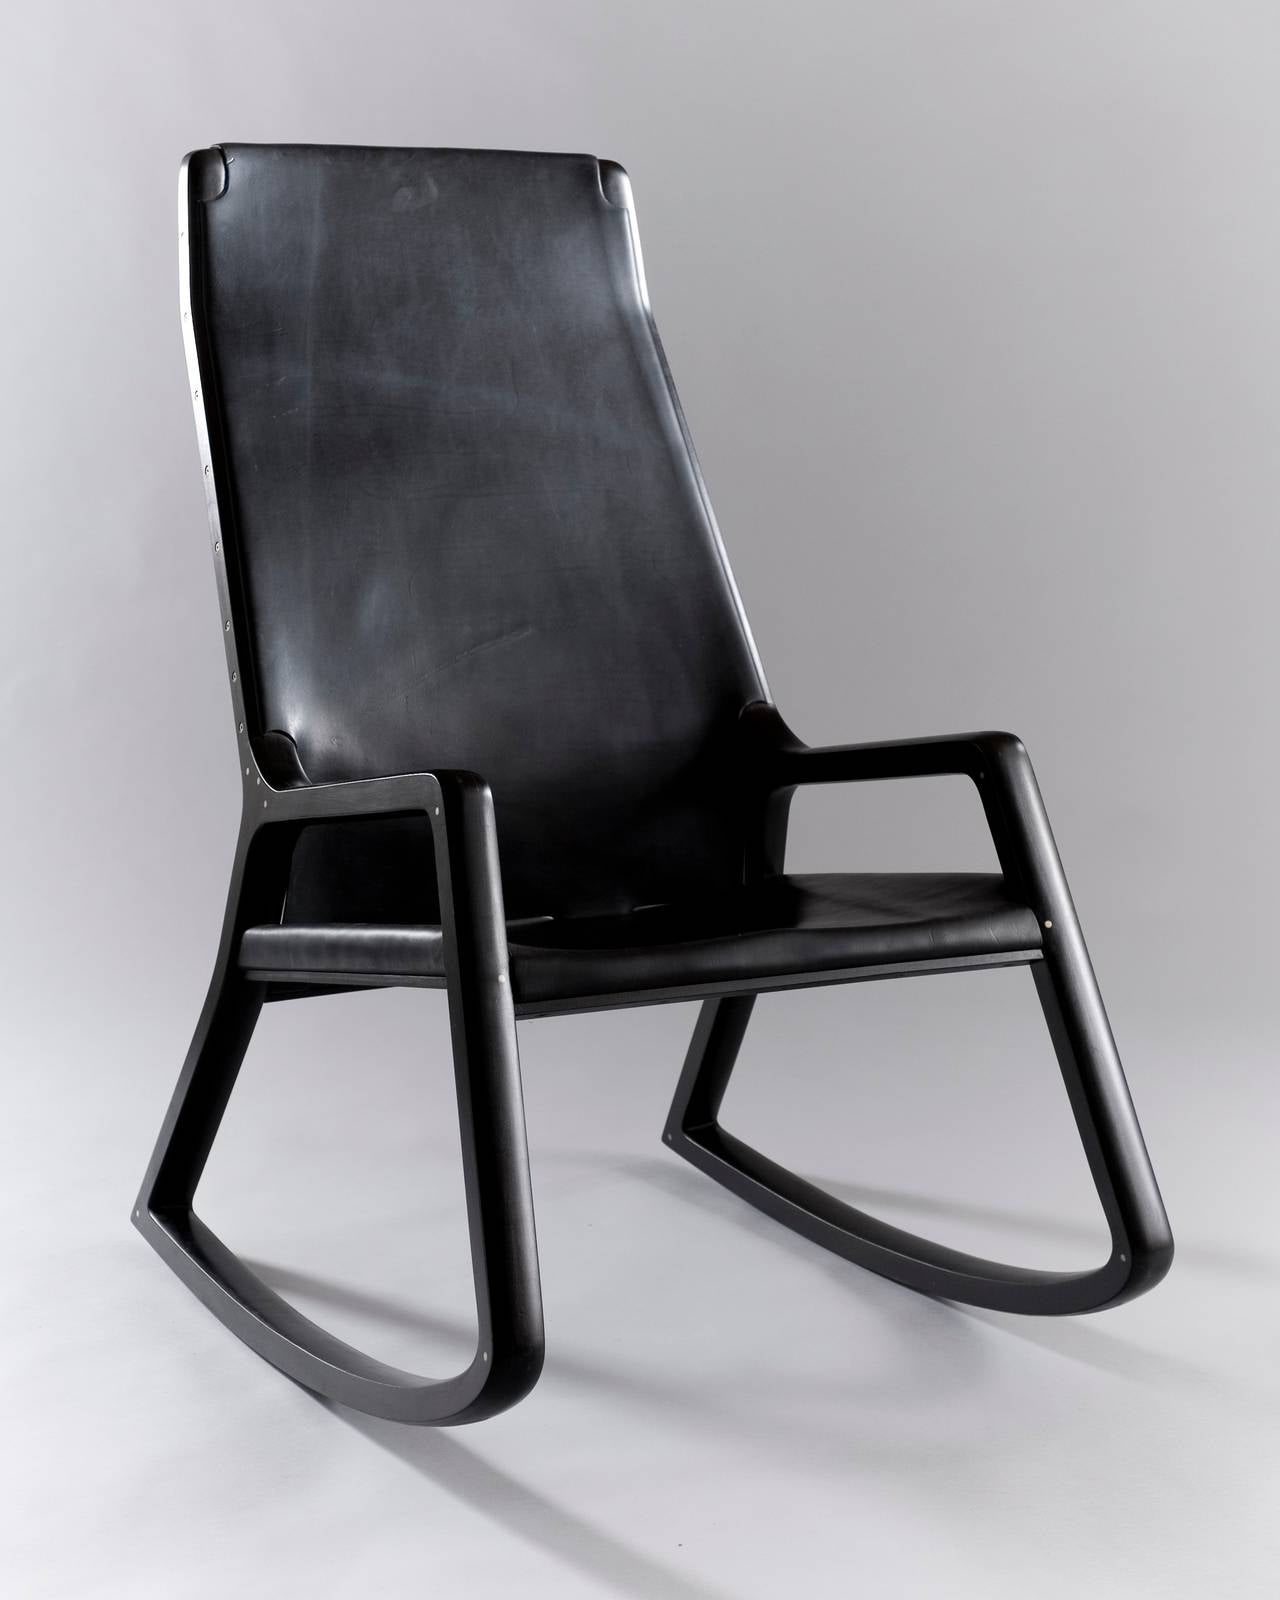 1890 Shaker 6 Mushroom Capped Rocker Chair with Shawl Bar at 1stdibs